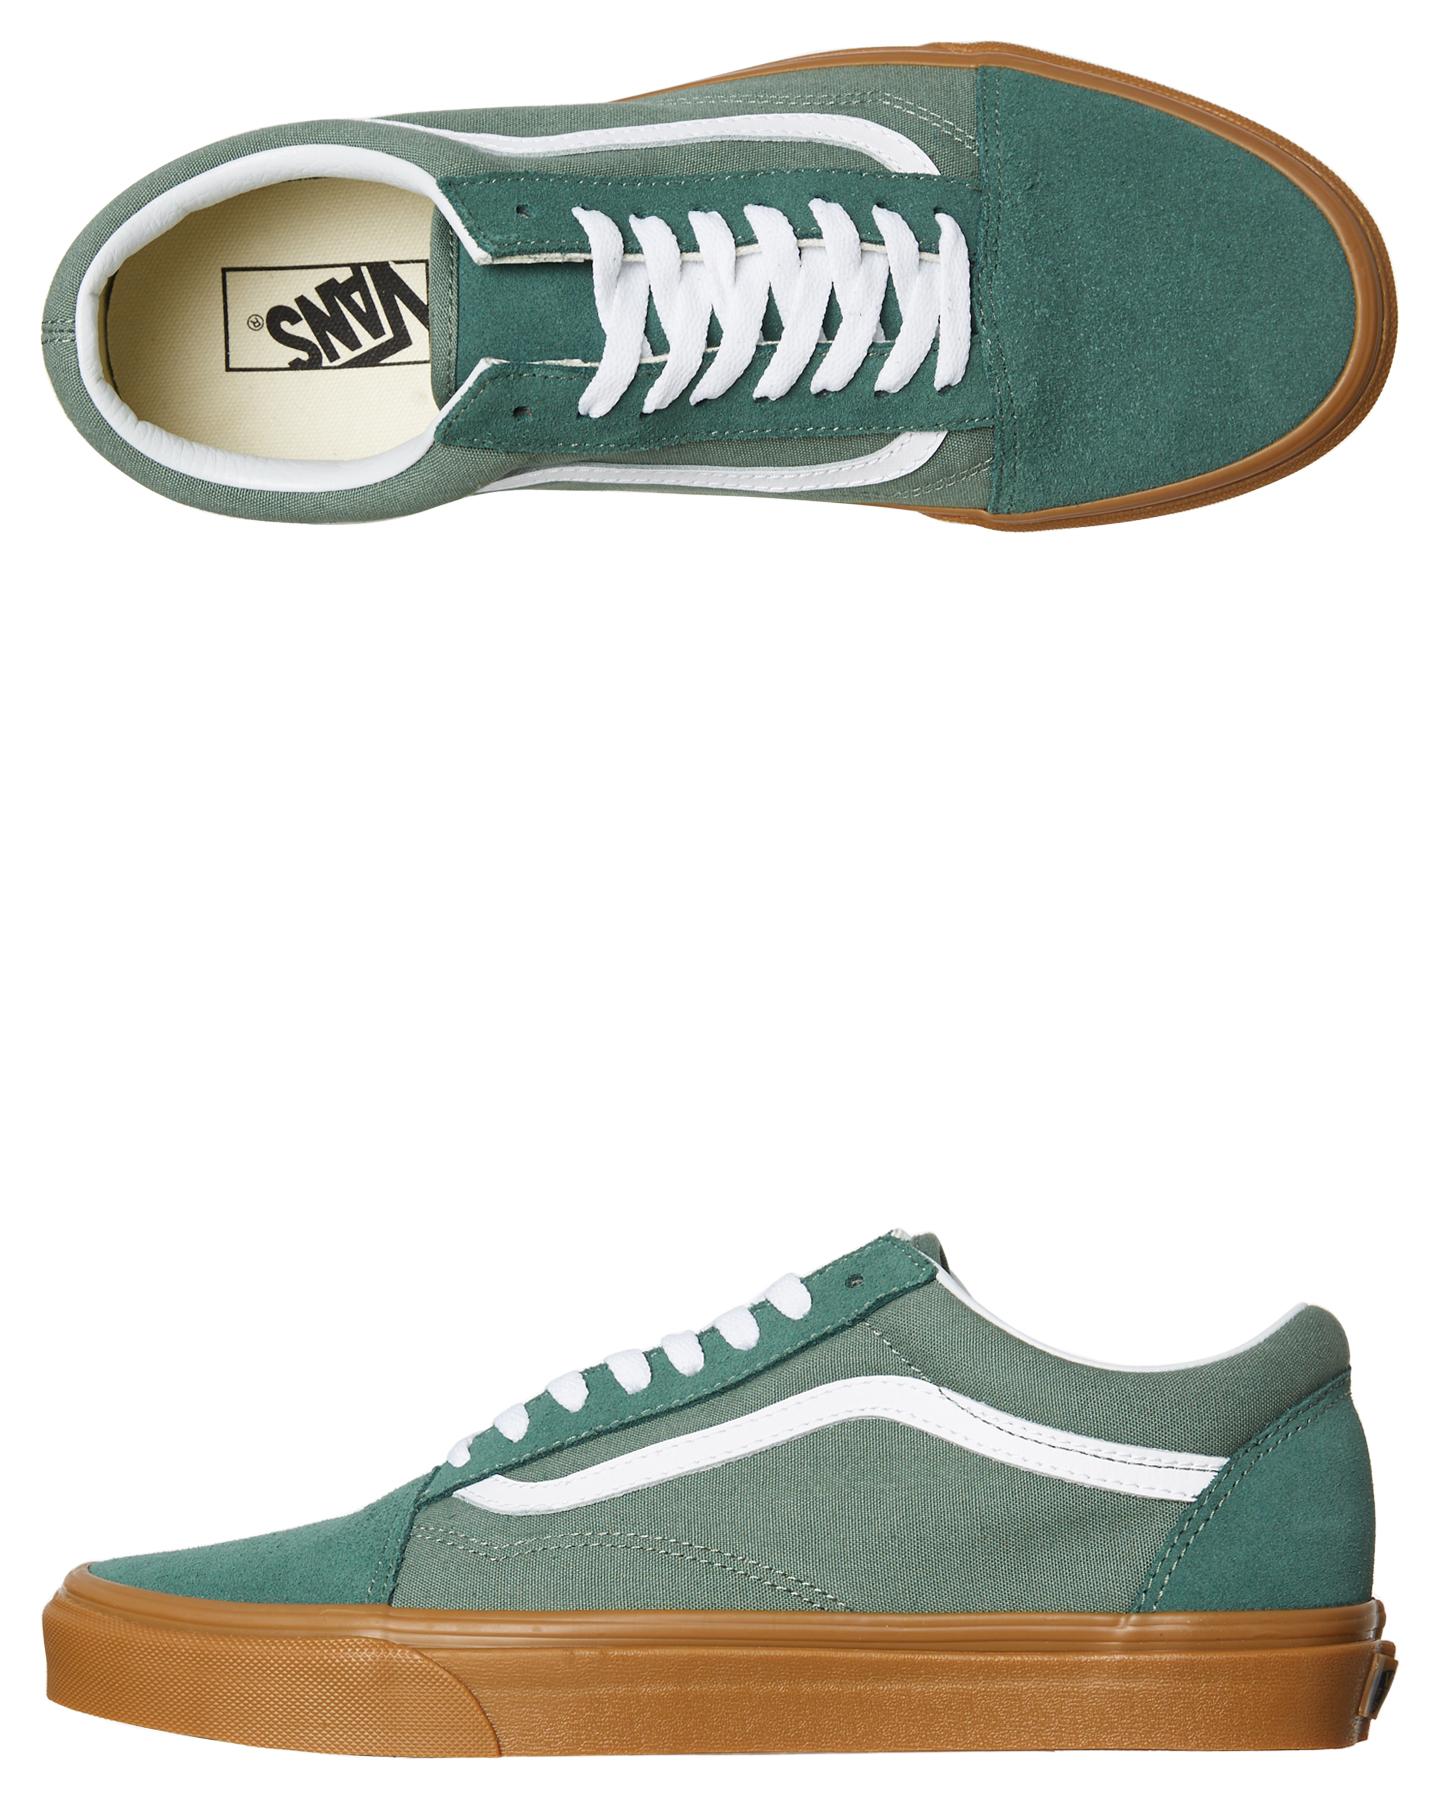 Details about New Vans Men s Old Skool Shoe Rubber Canvas Green f79bd3f69